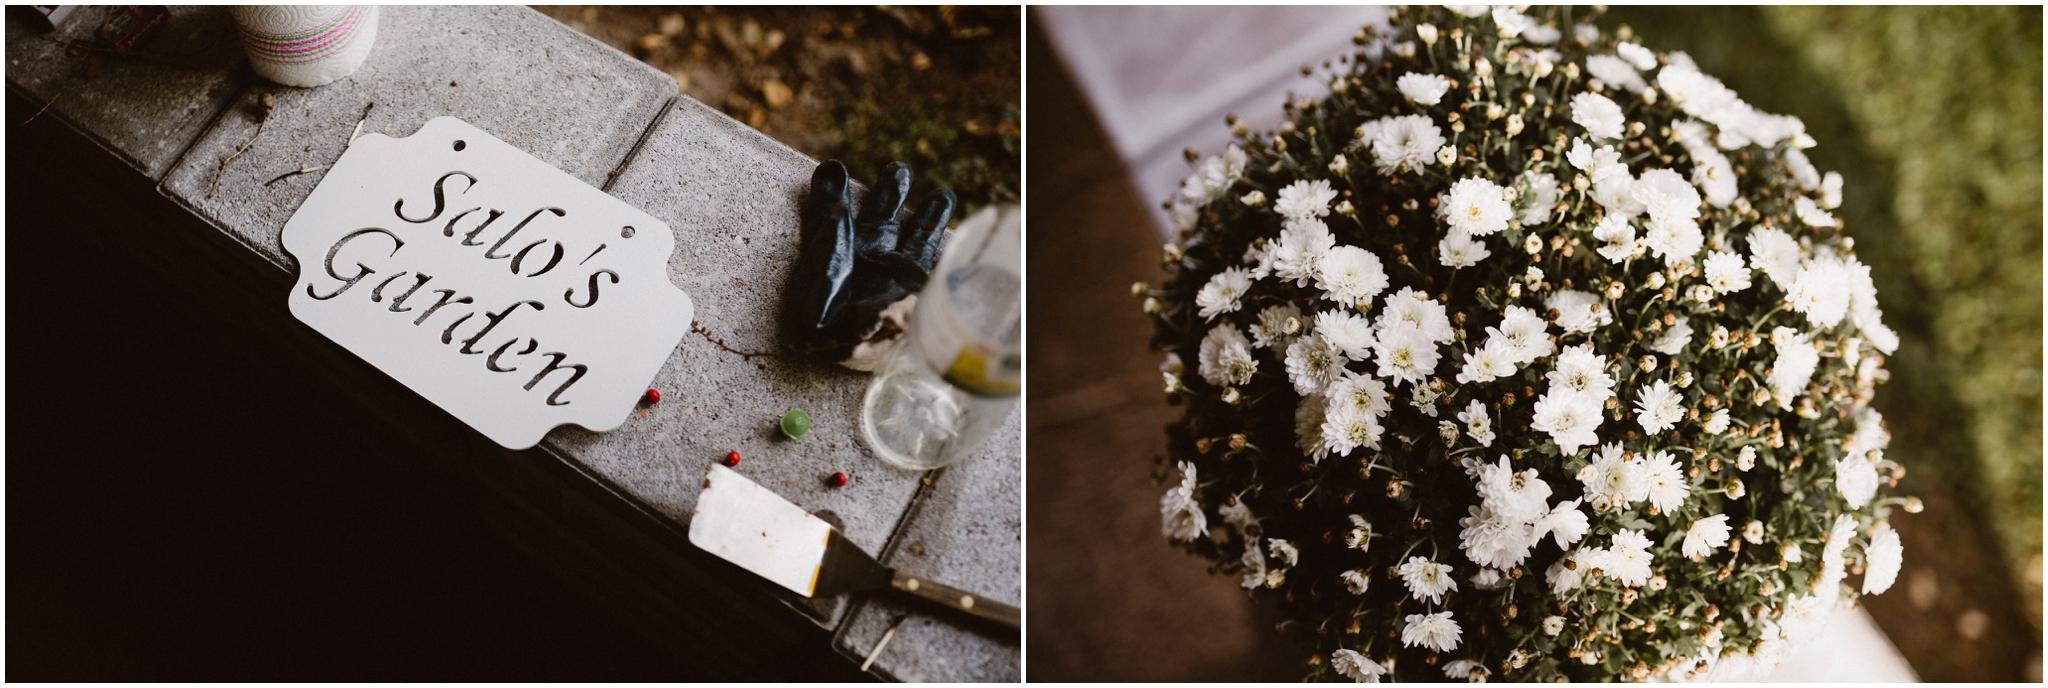 Leevi + Susanna -- Patrick Karkkolainen Wedding Photographer + Adventurer-4.jpg